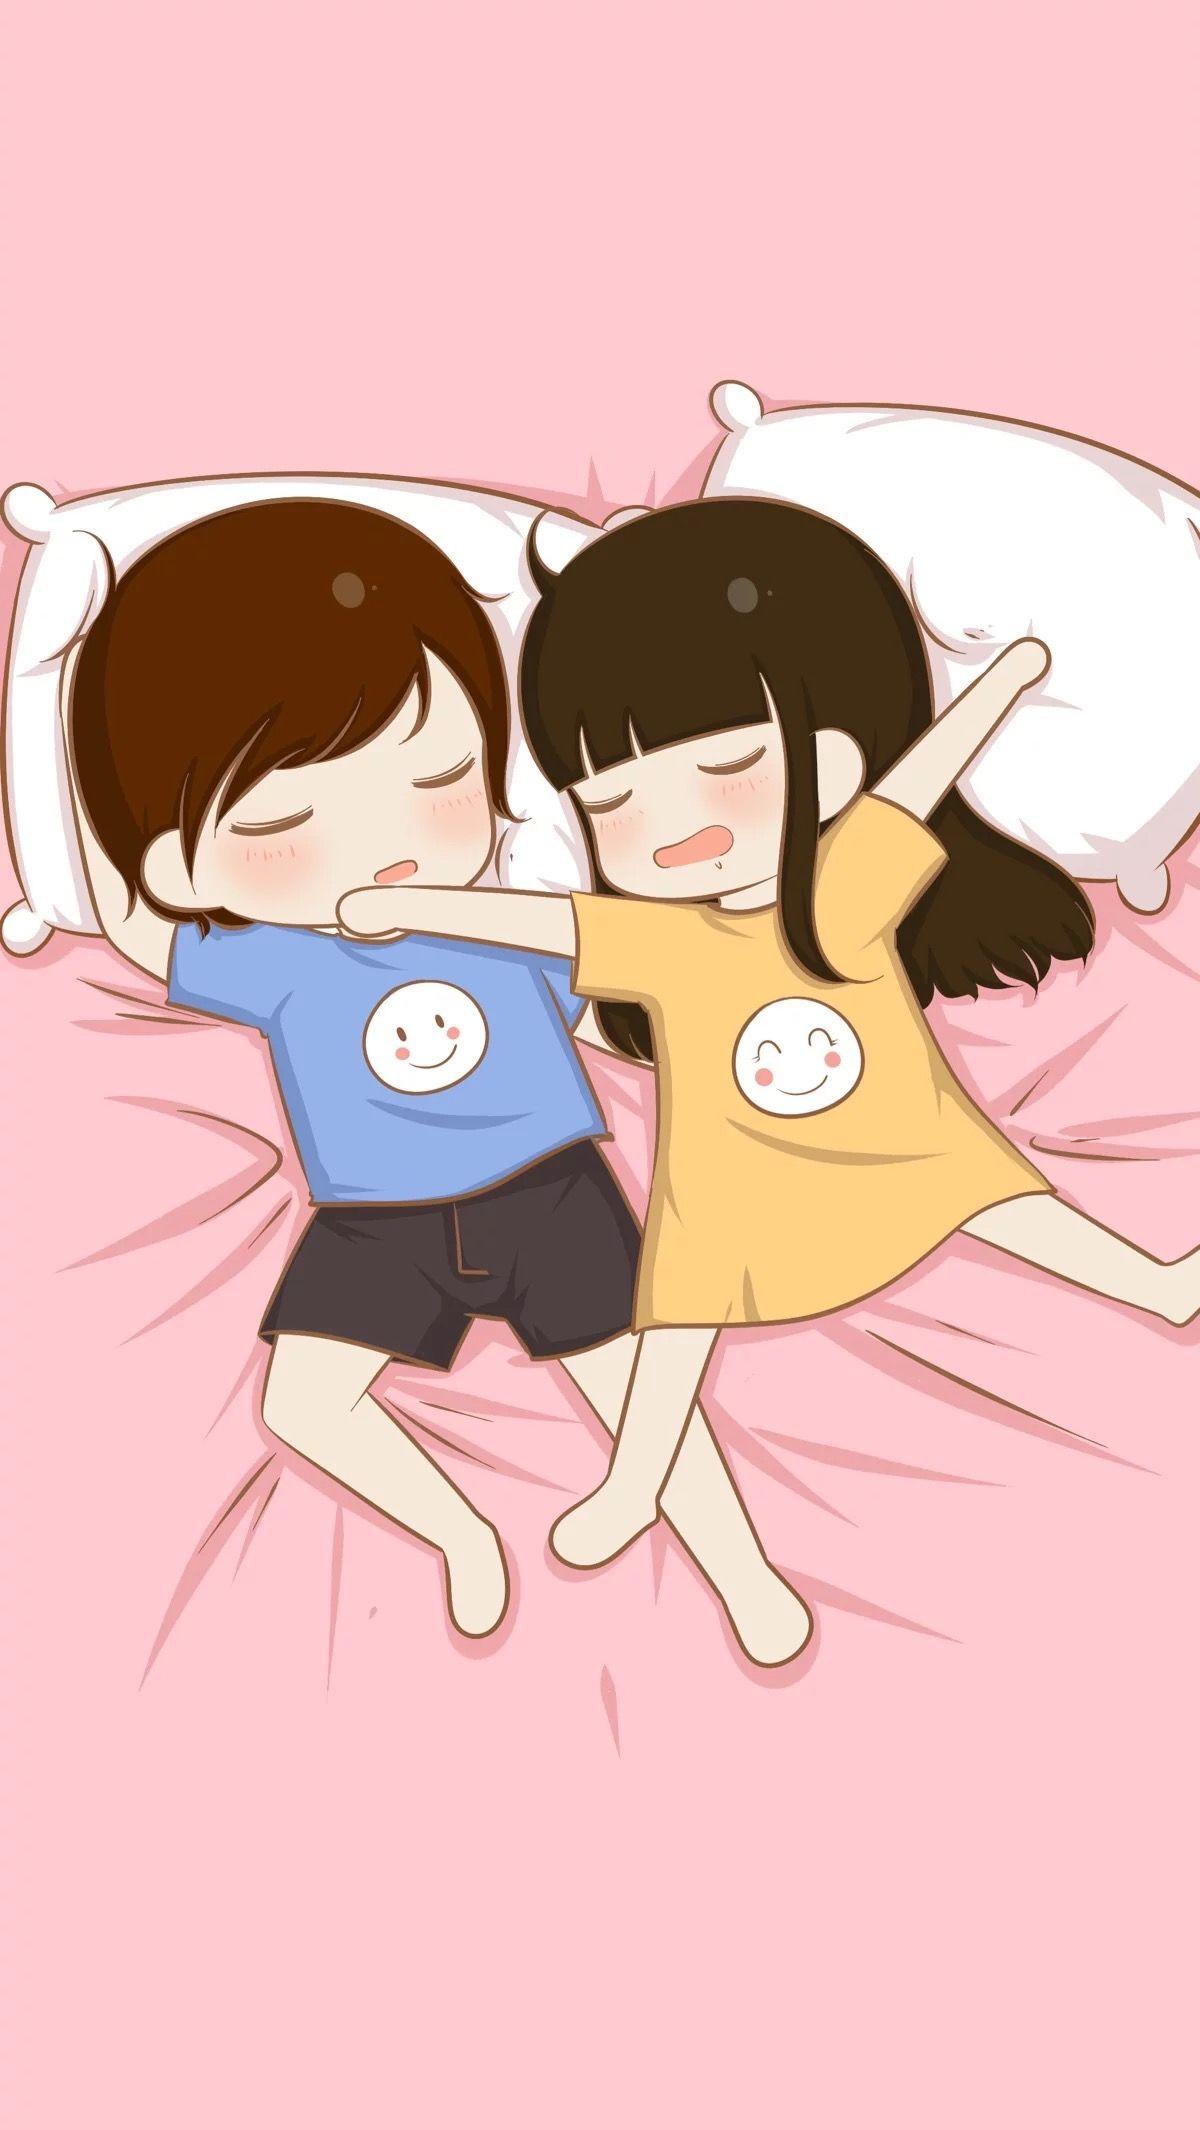 A Kawaii Wallper Cute Love Cartoons Love Cartoon Couple Cartoons Love